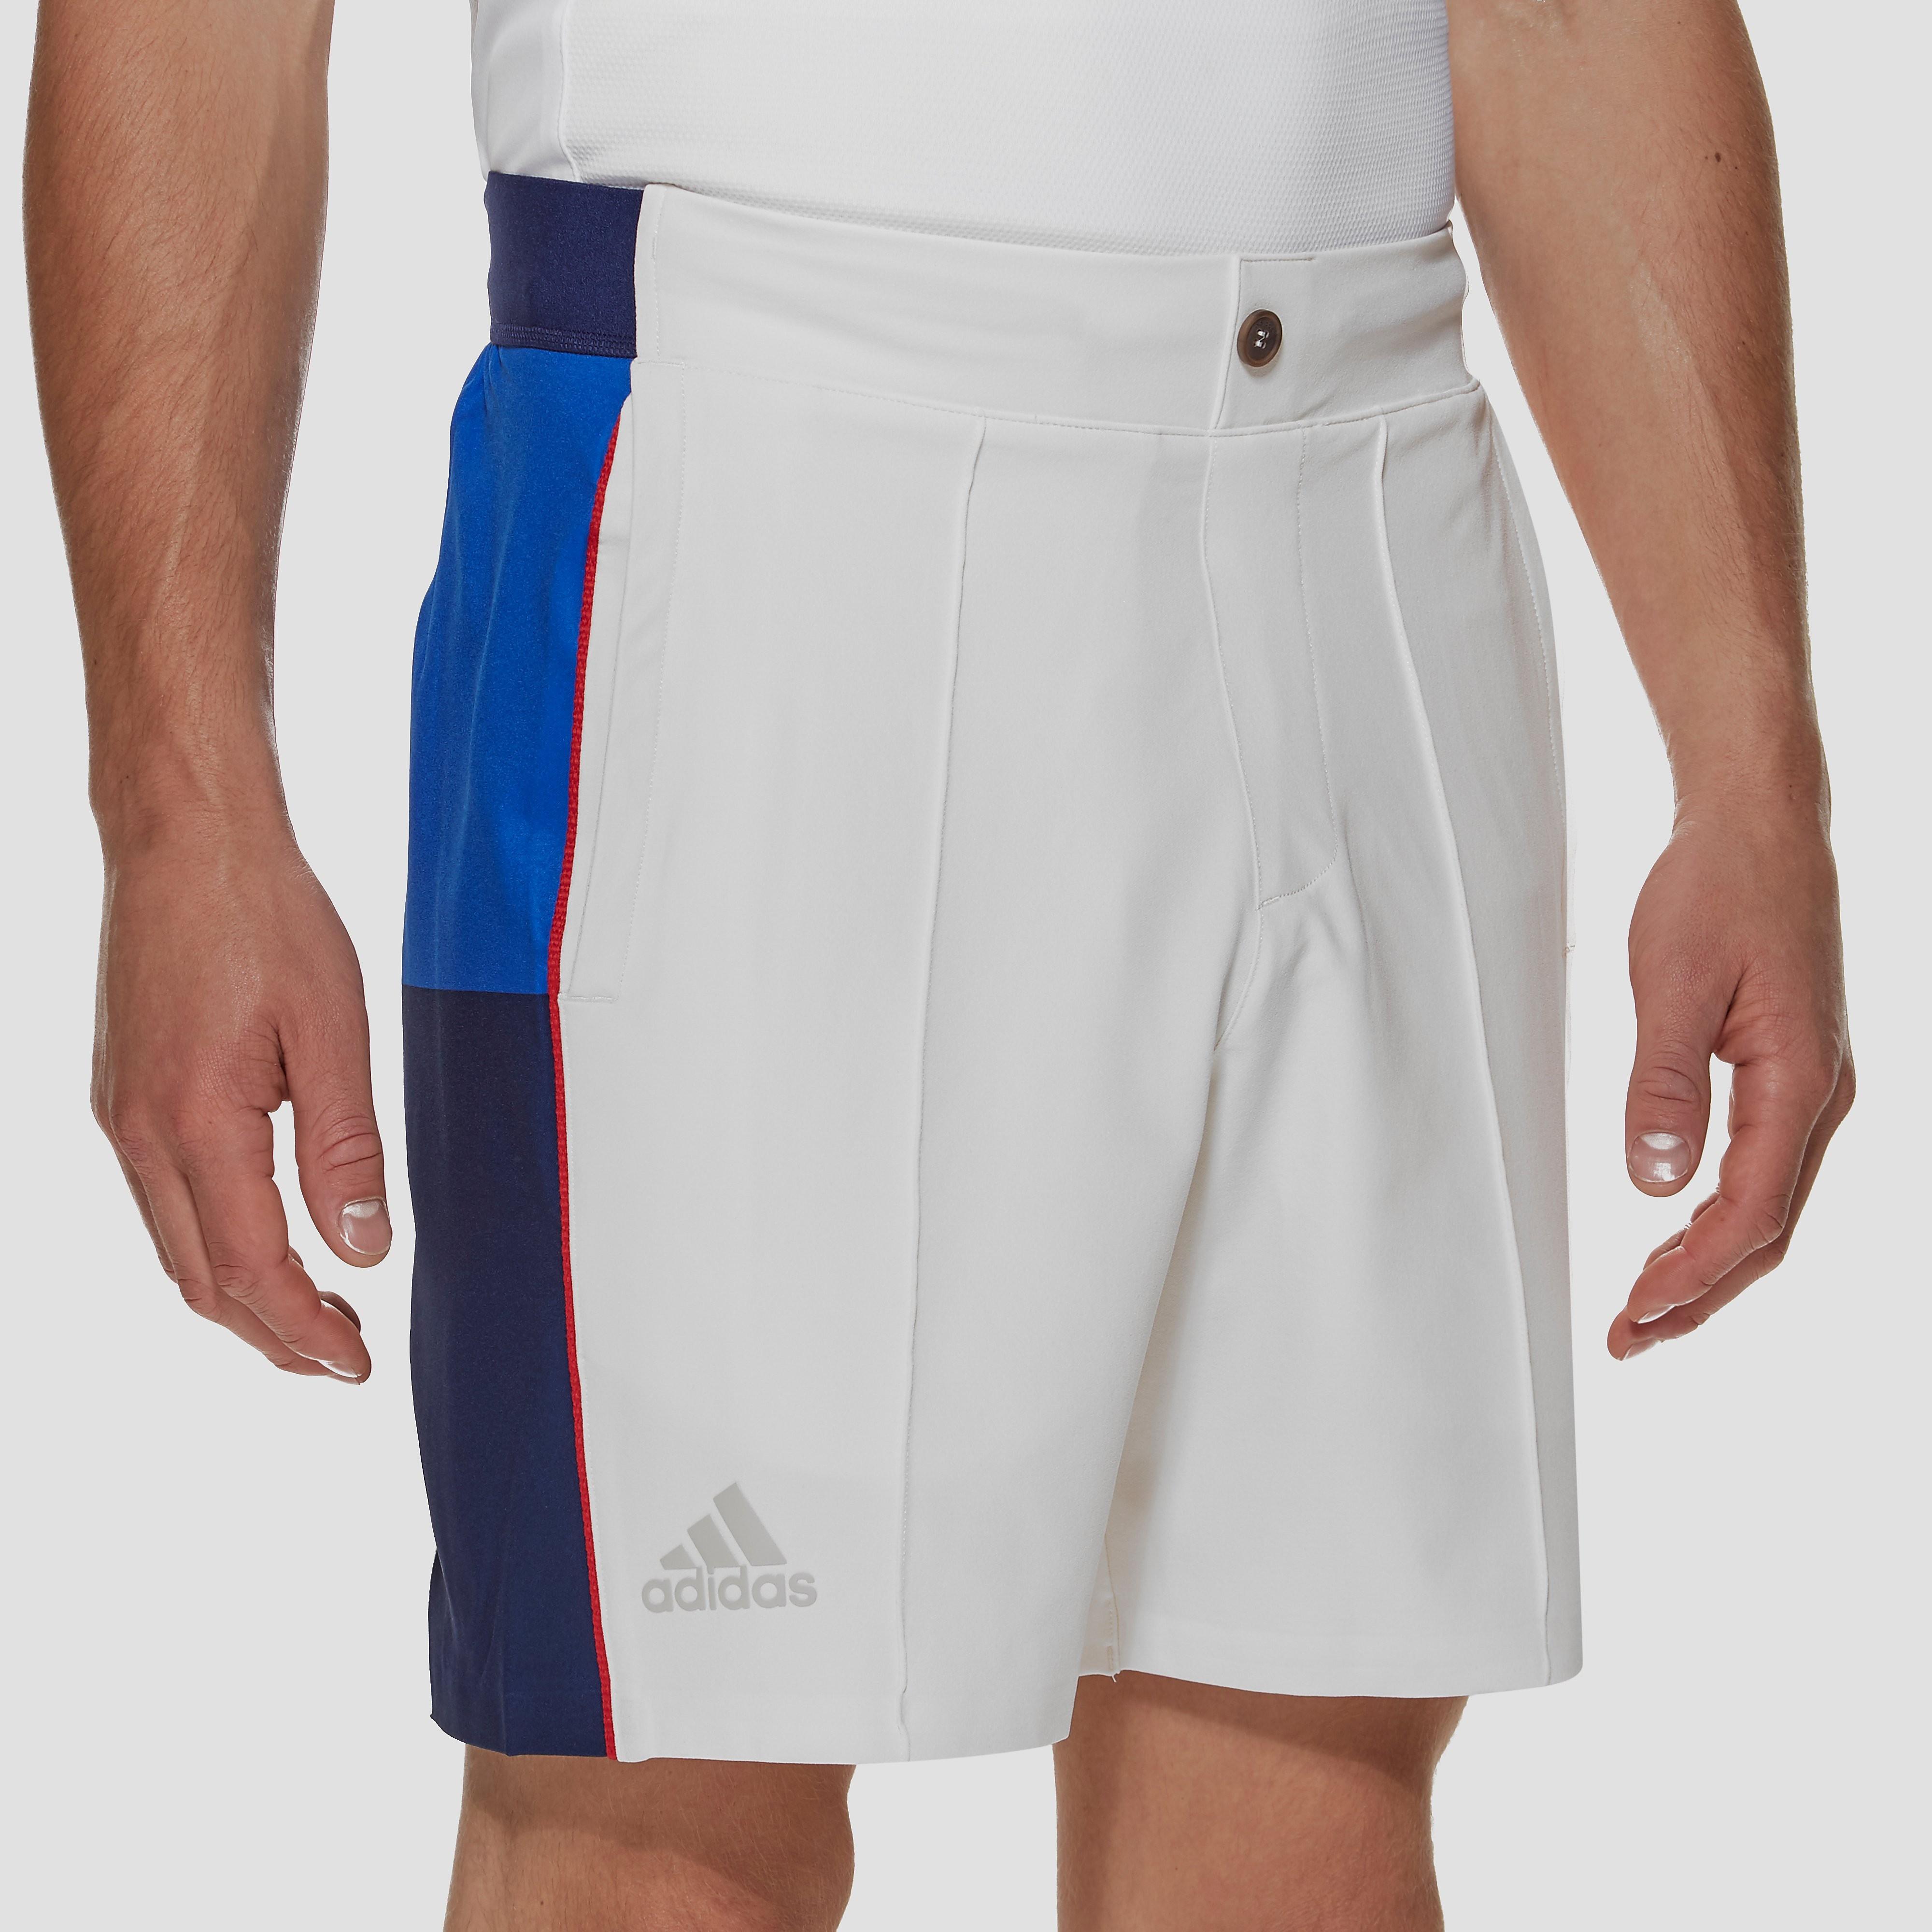 adidas Pharrell Williams New York Men's Colourblock Shorts